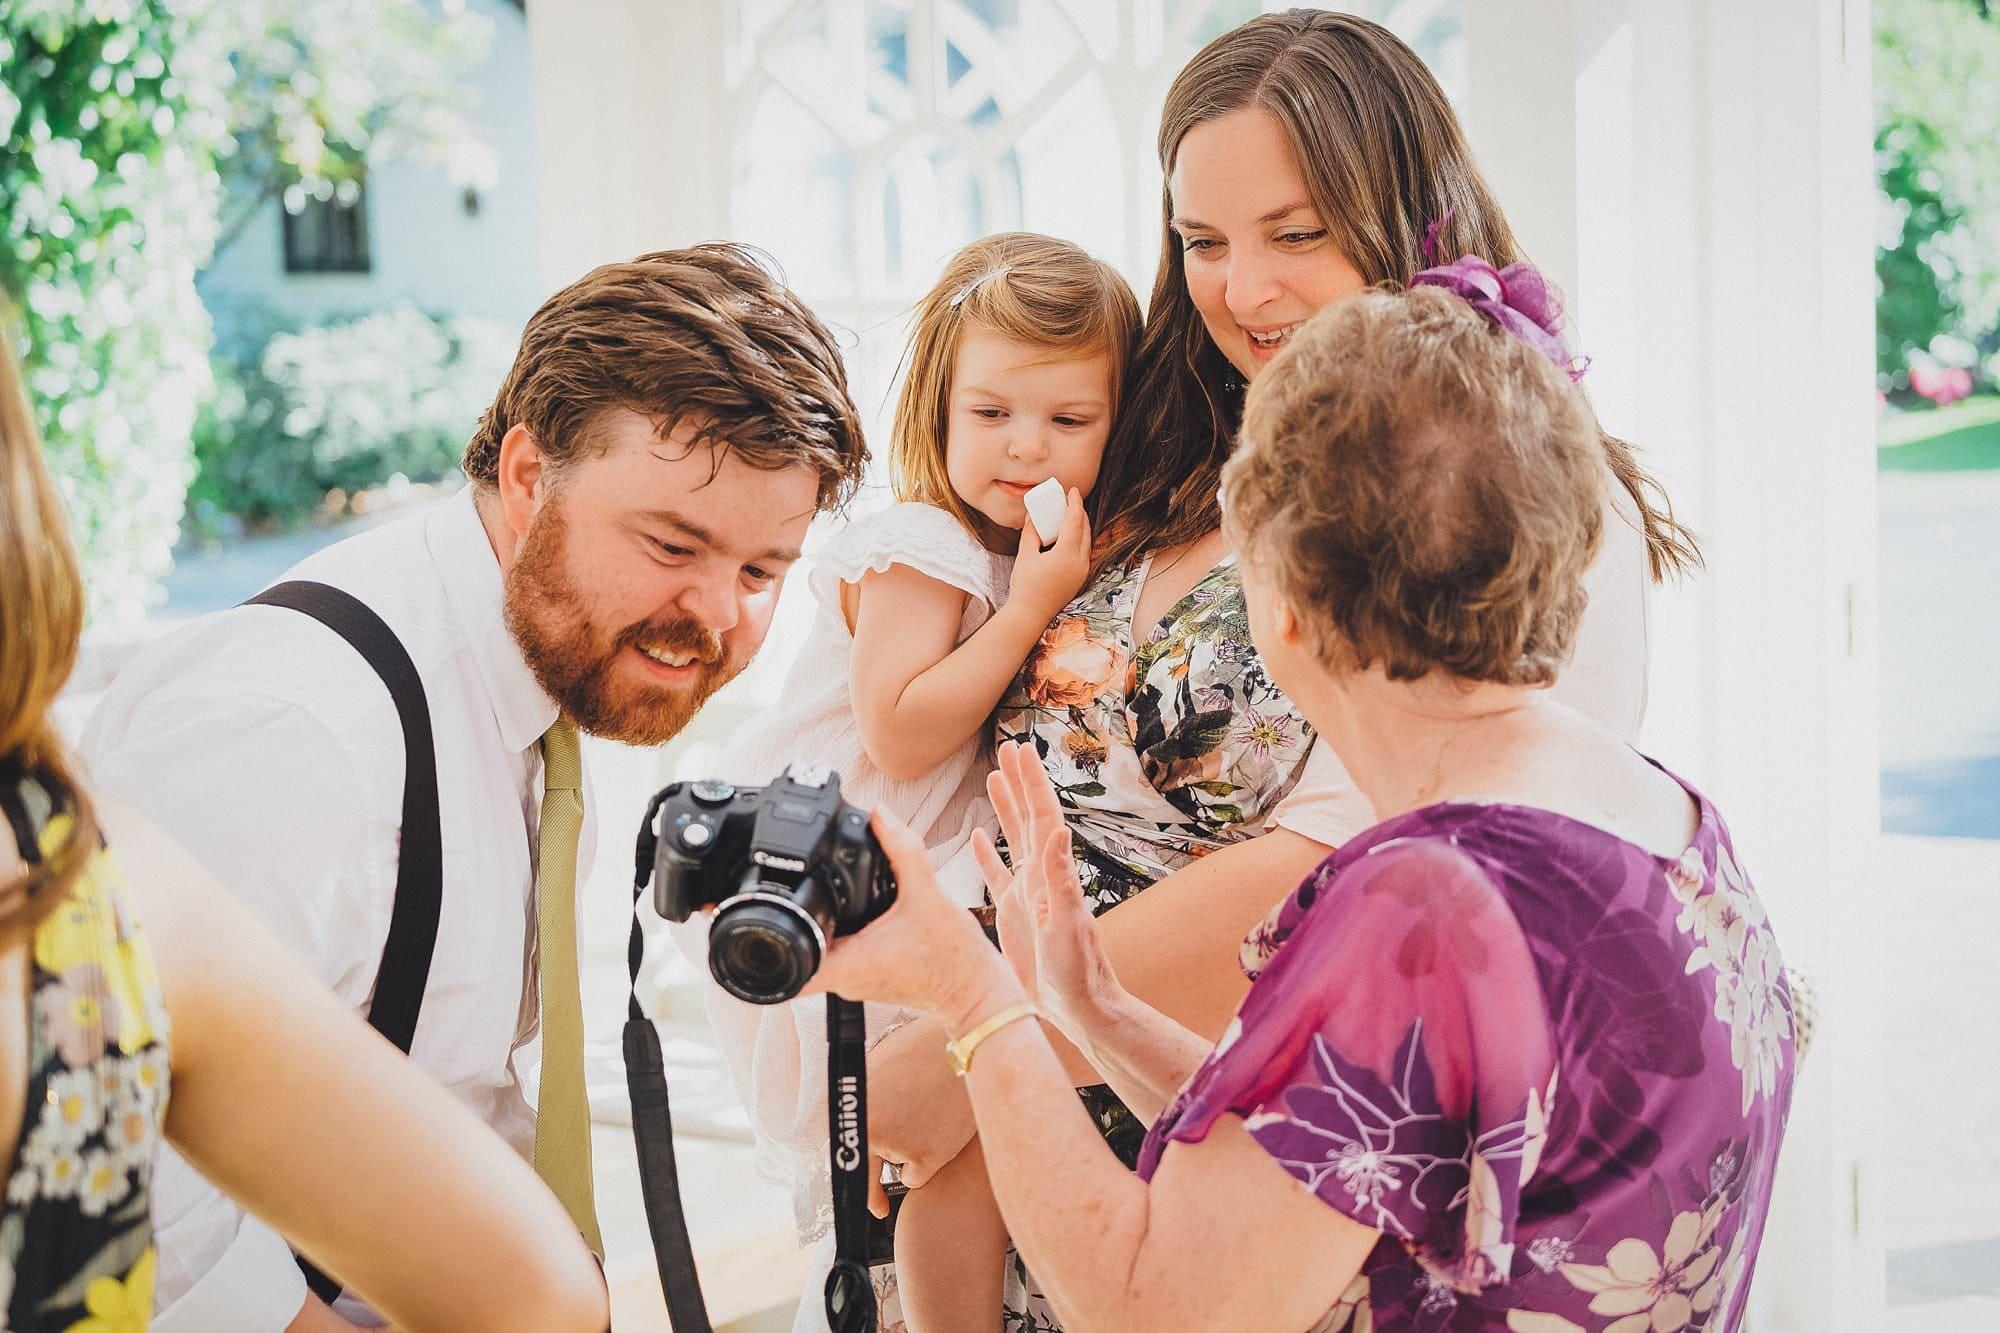 oaks farm wedding photographer cj 078 - Cat + Jake   Oaks Farm Wedding Photography